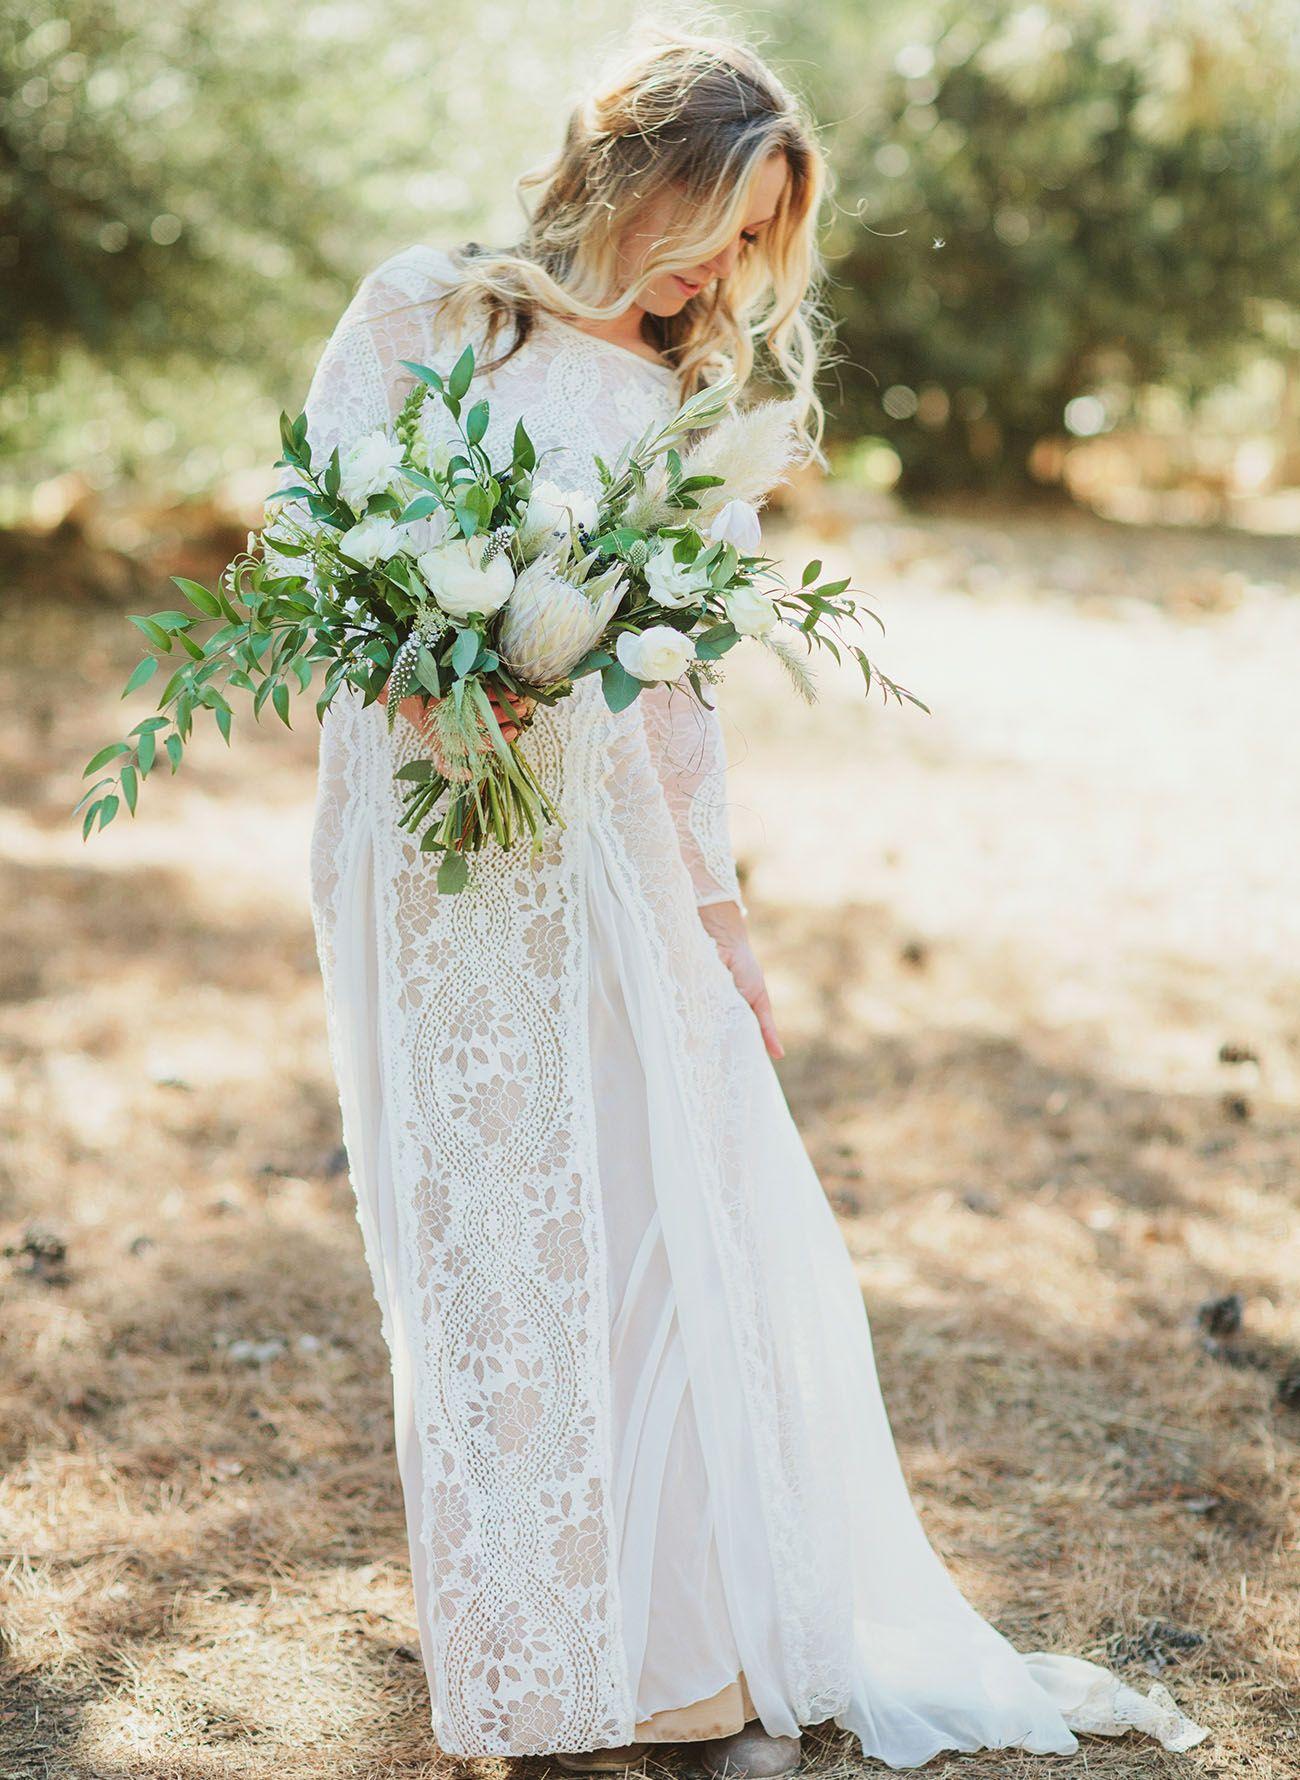 This boho chic wedding revolved around mud cloth robes wedding